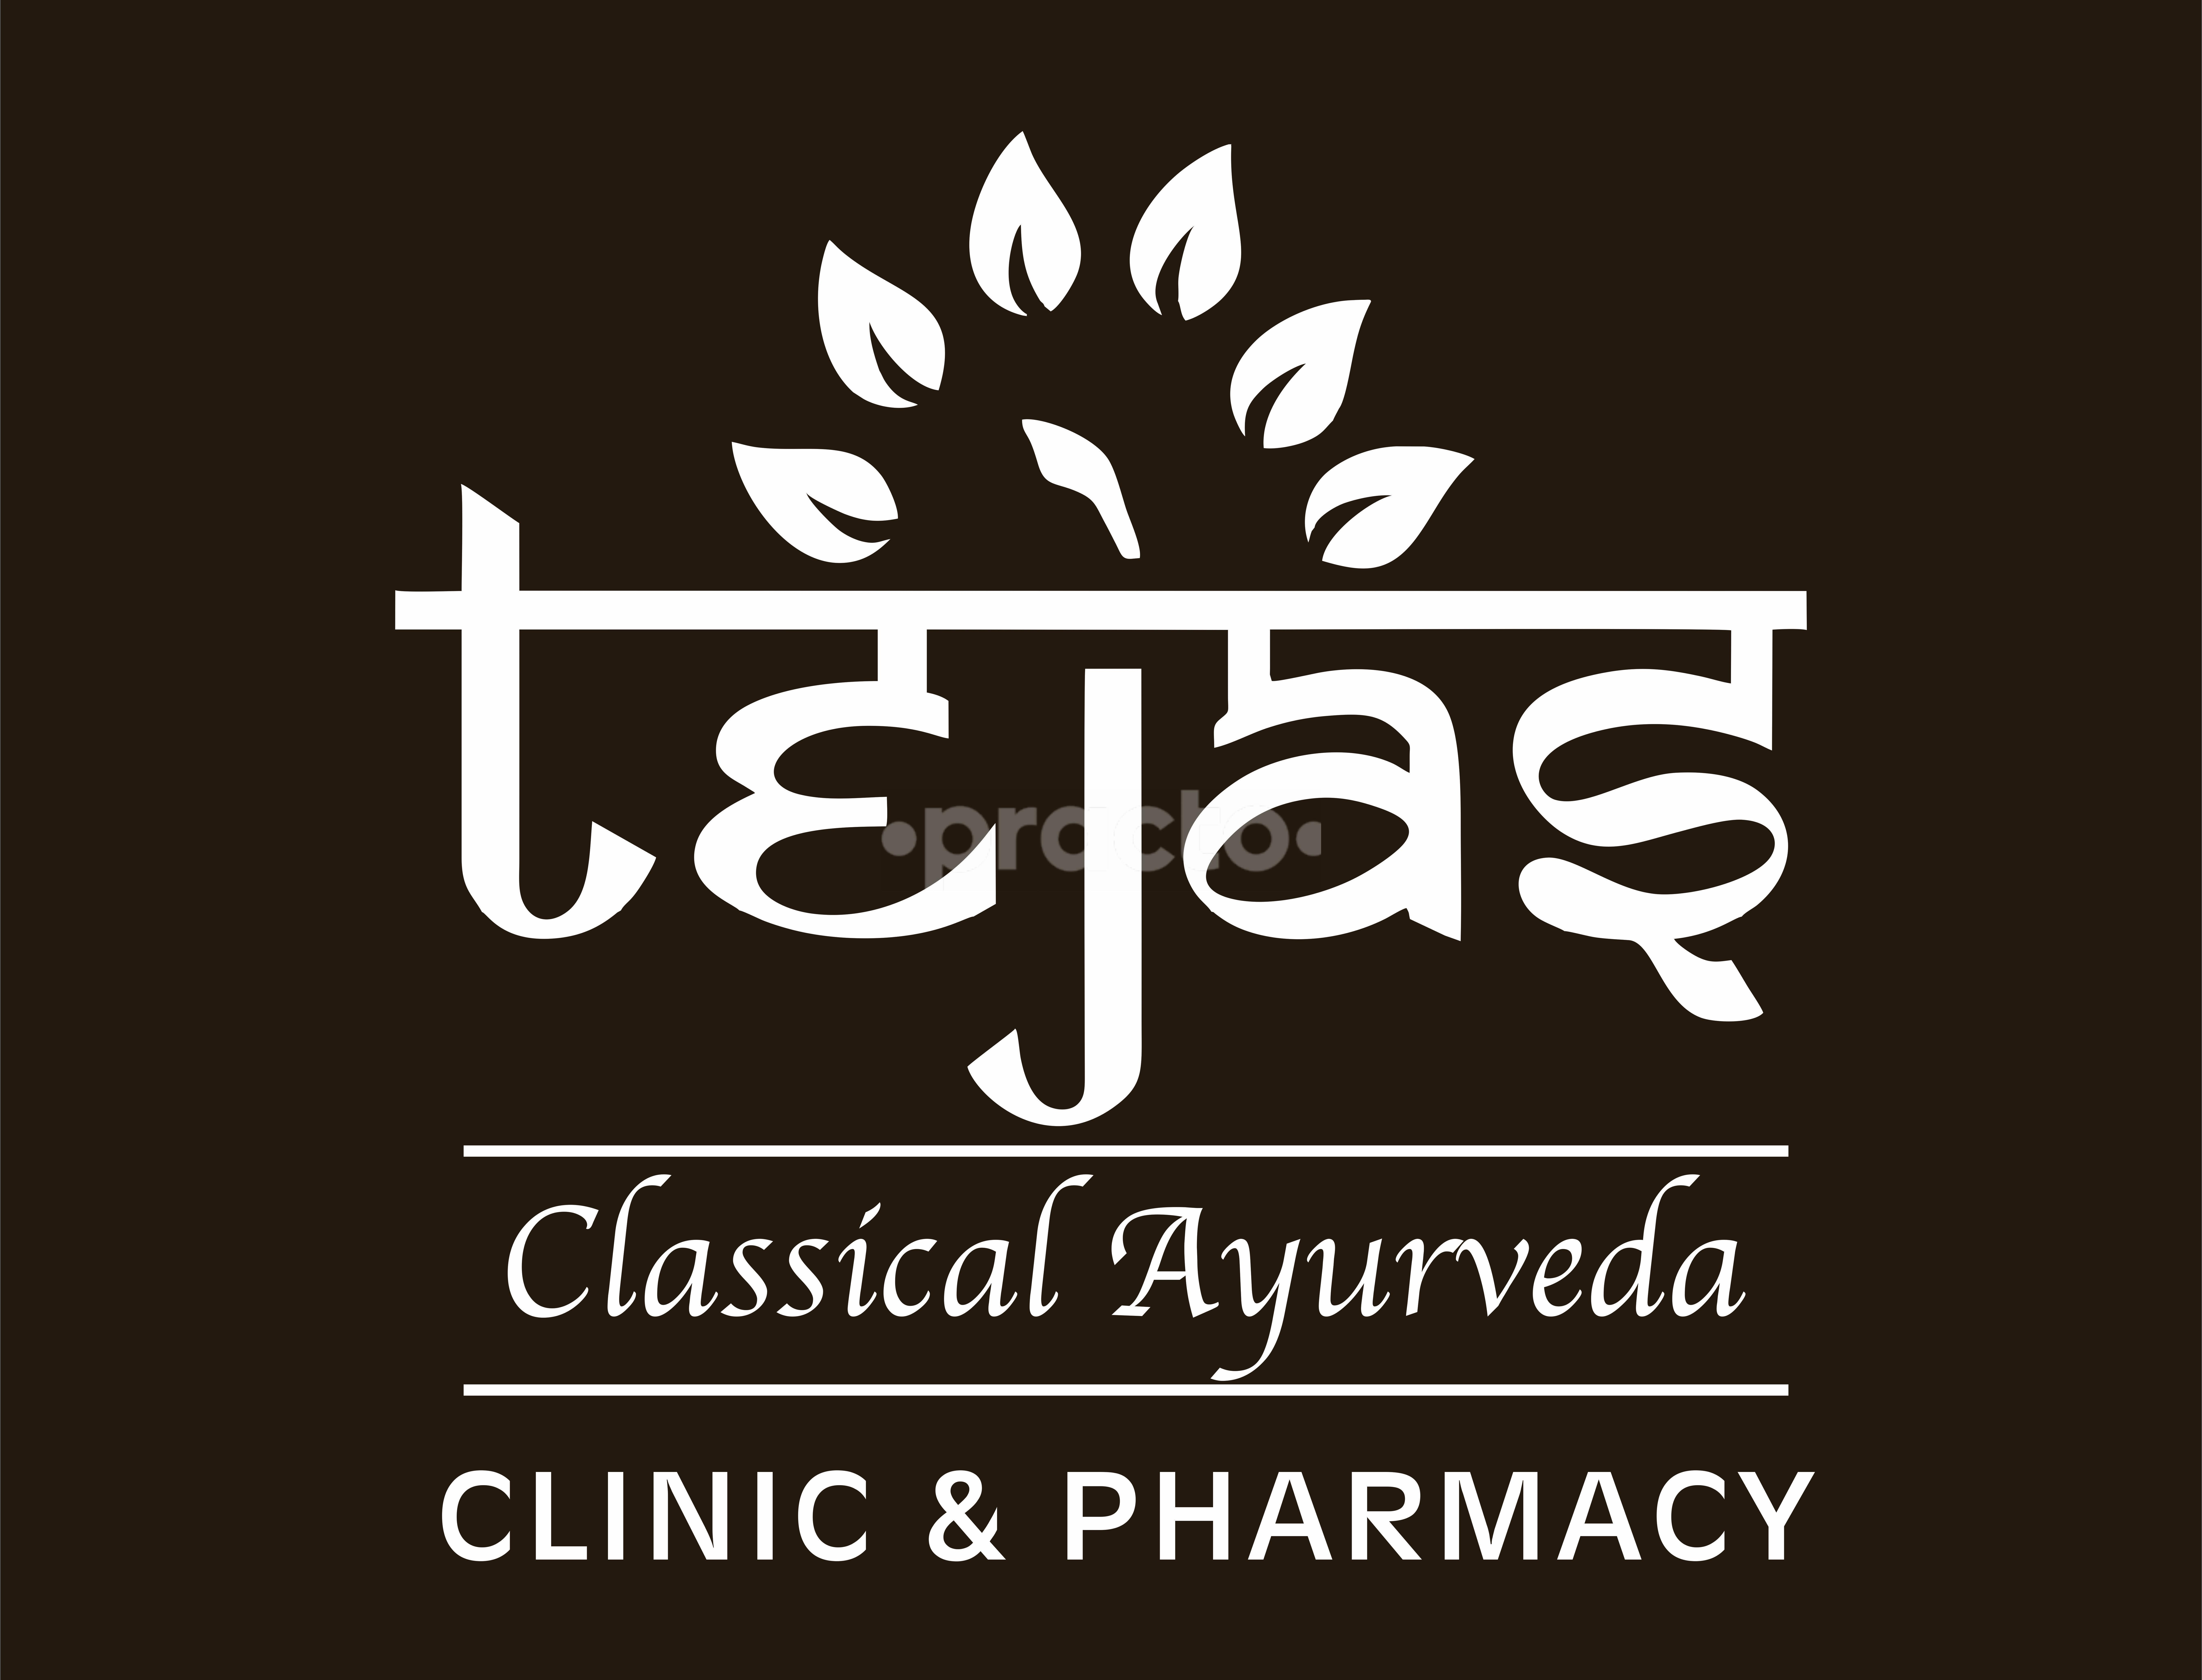 Tejas Classical Ayurveda